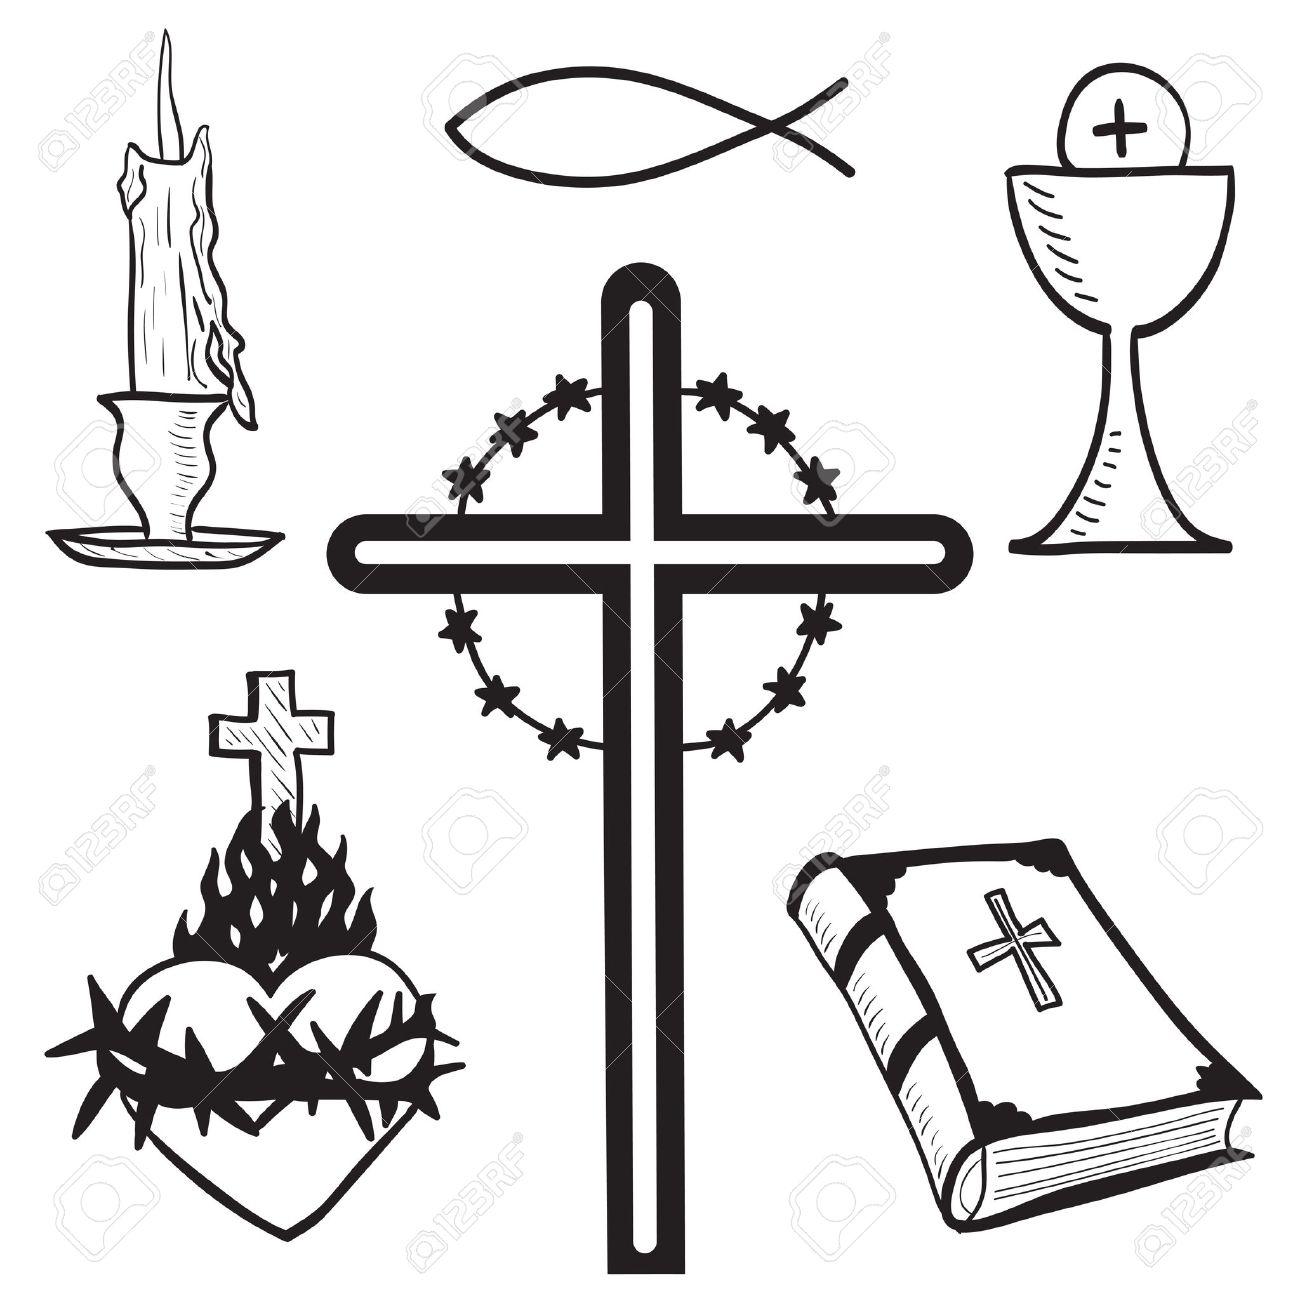 Catholic clipart roman catholic, Catholic roman catholic.